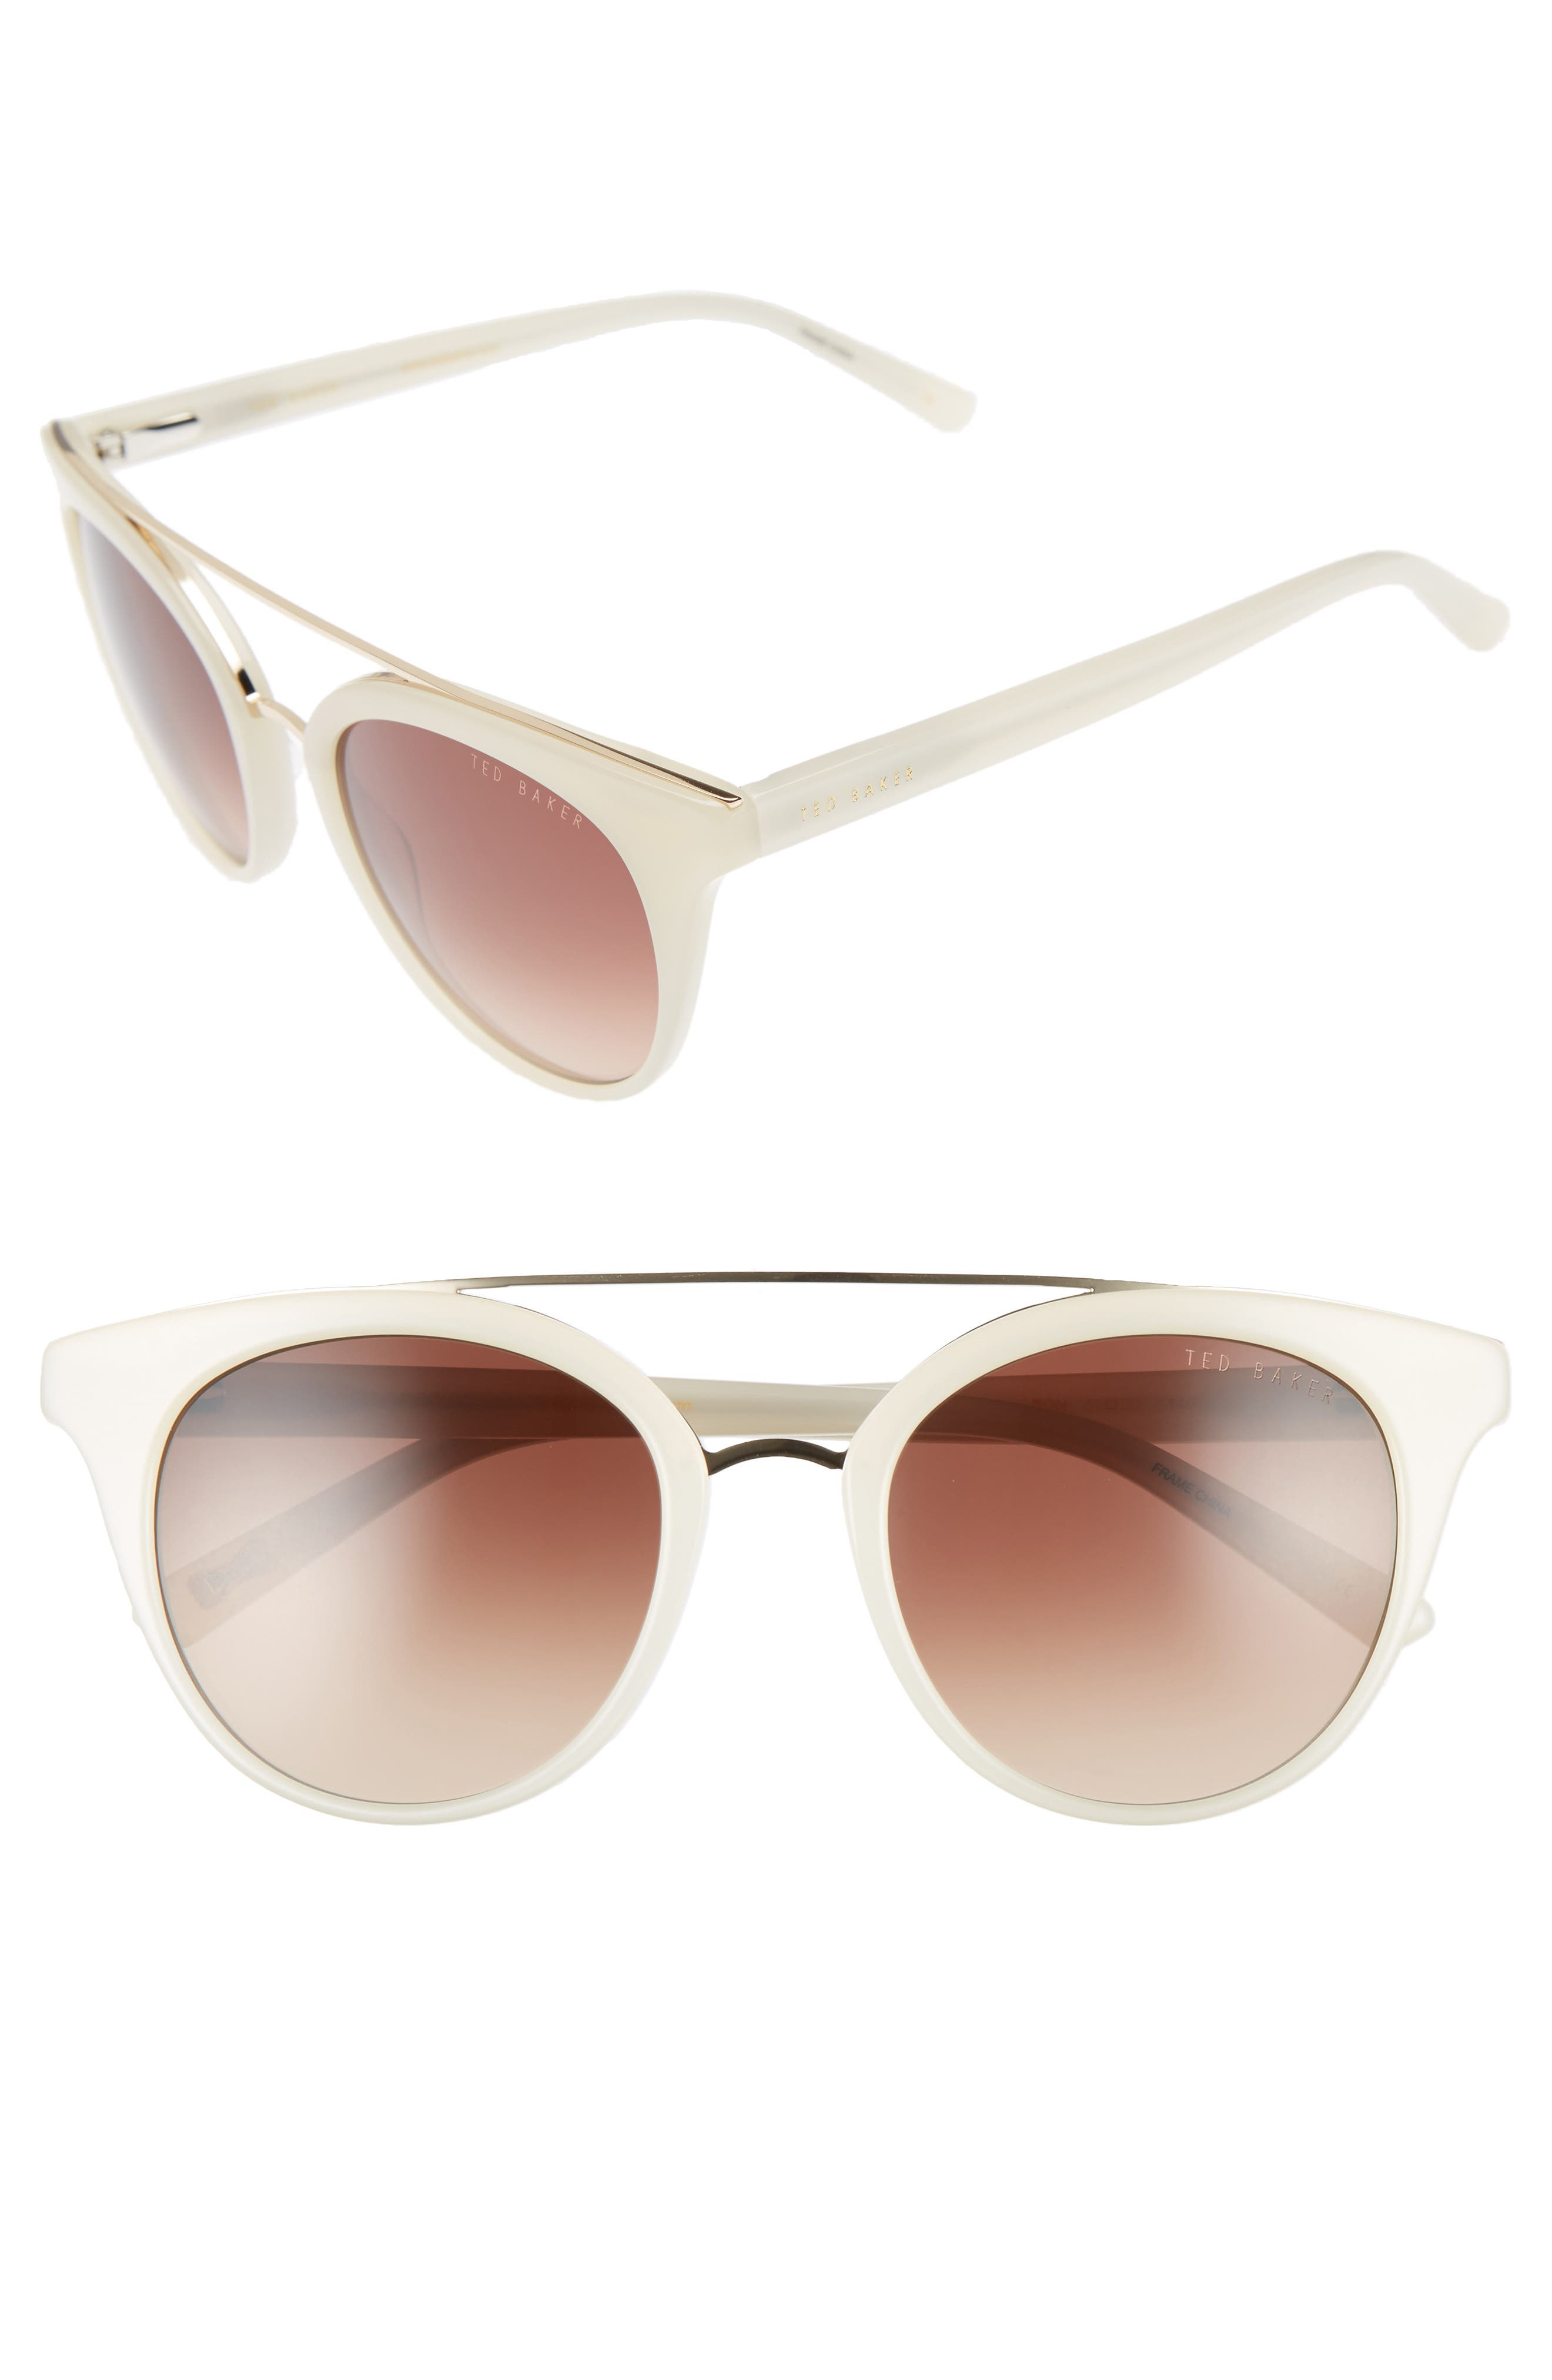 Ted Baker London 51mm Gradient Lens Round Retro Sunglasses